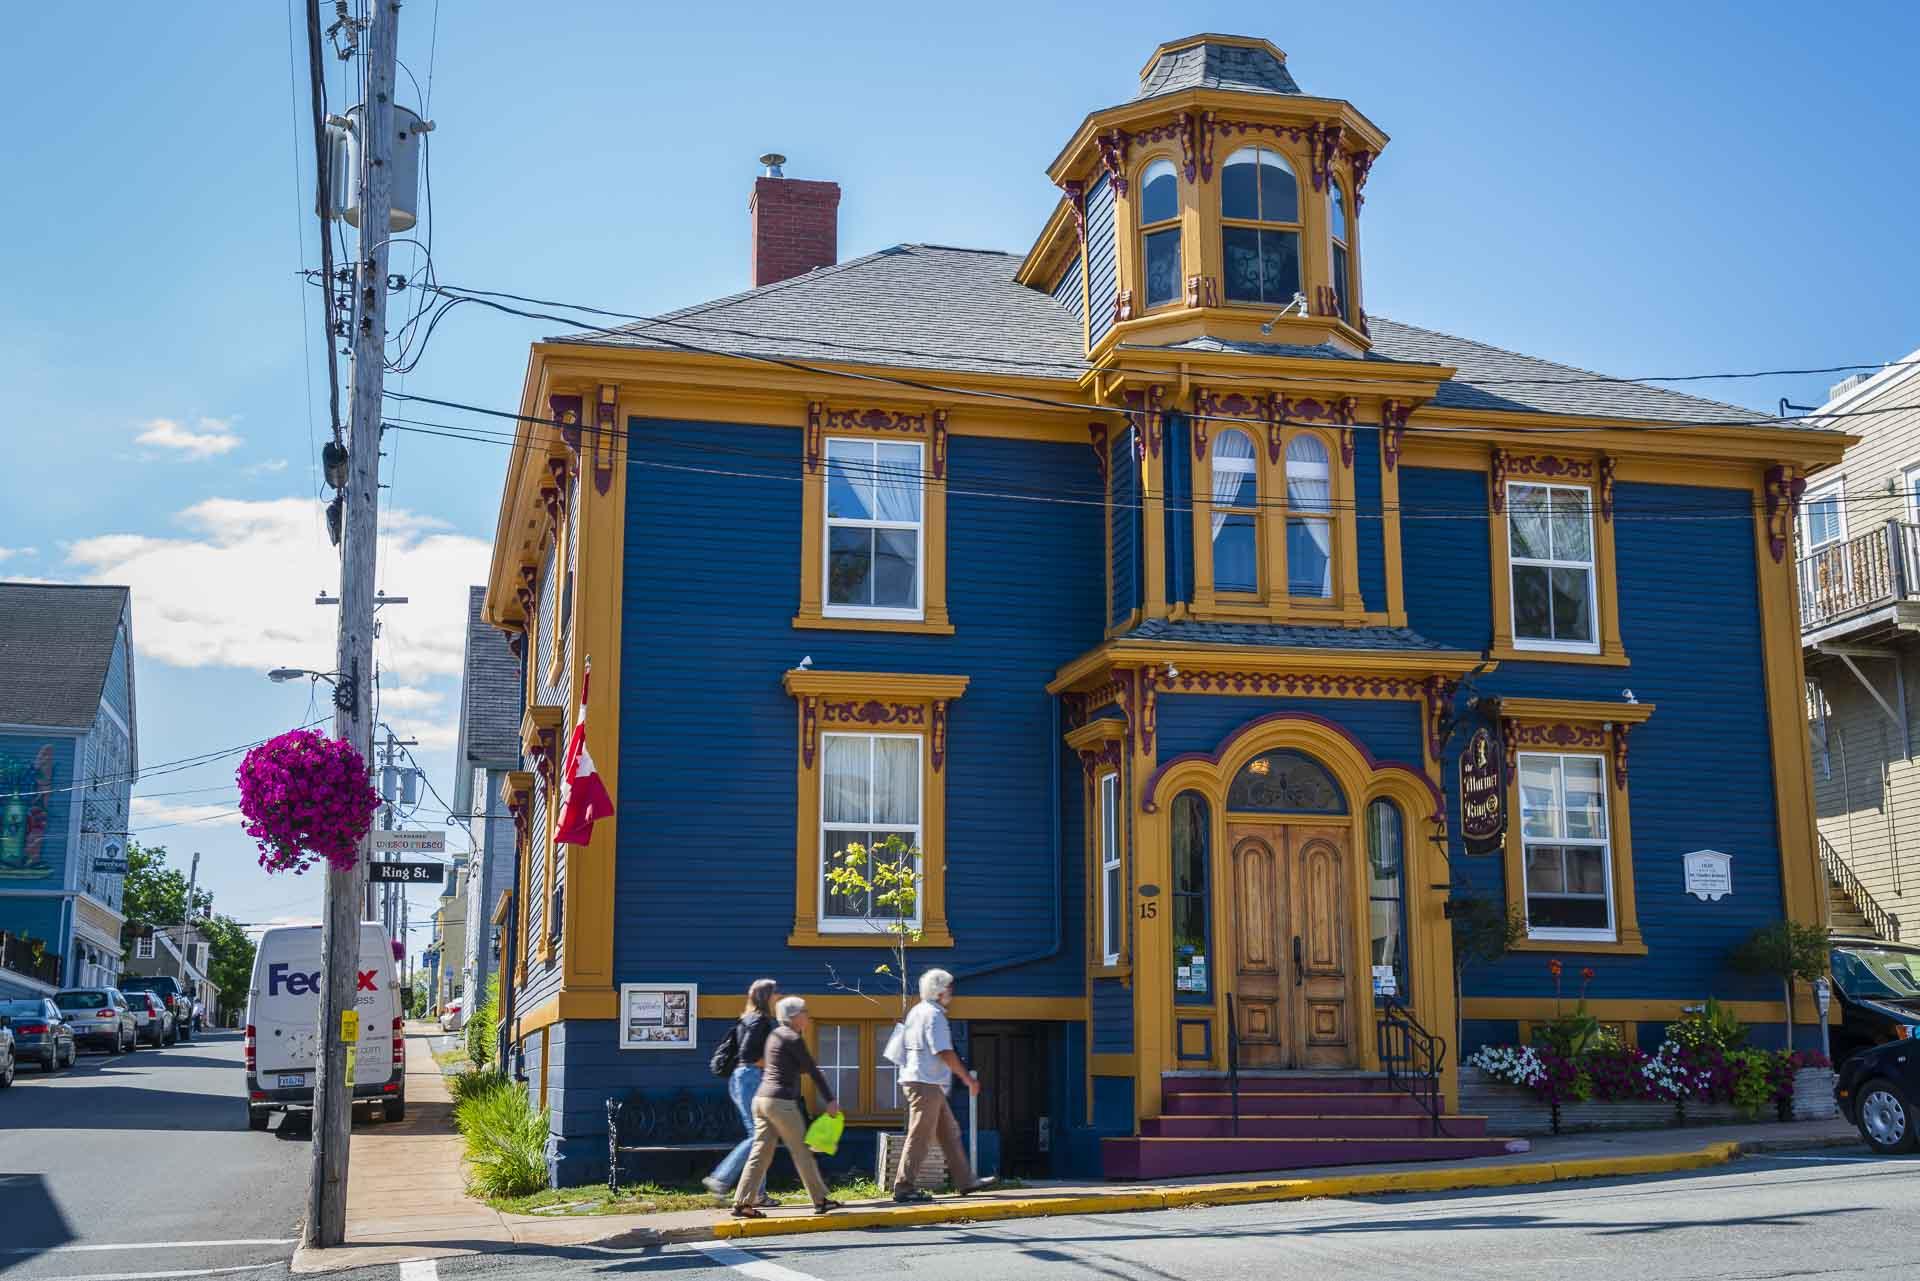 downtown lunenbur Nova Scotia